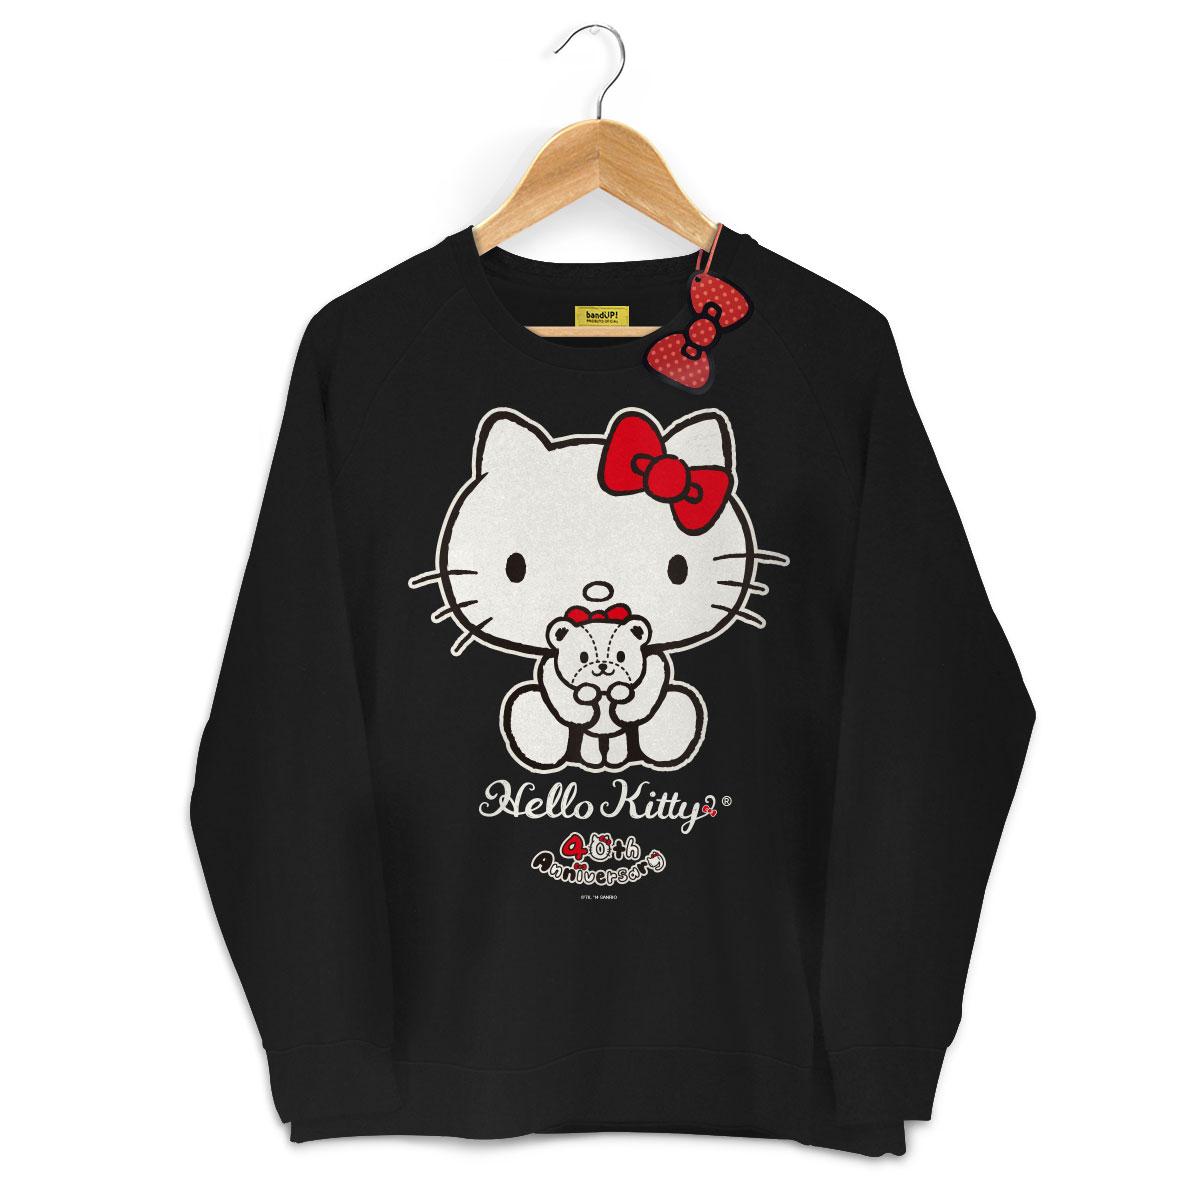 Moletinho Preto Hello Kitty 40th Ribbon 3